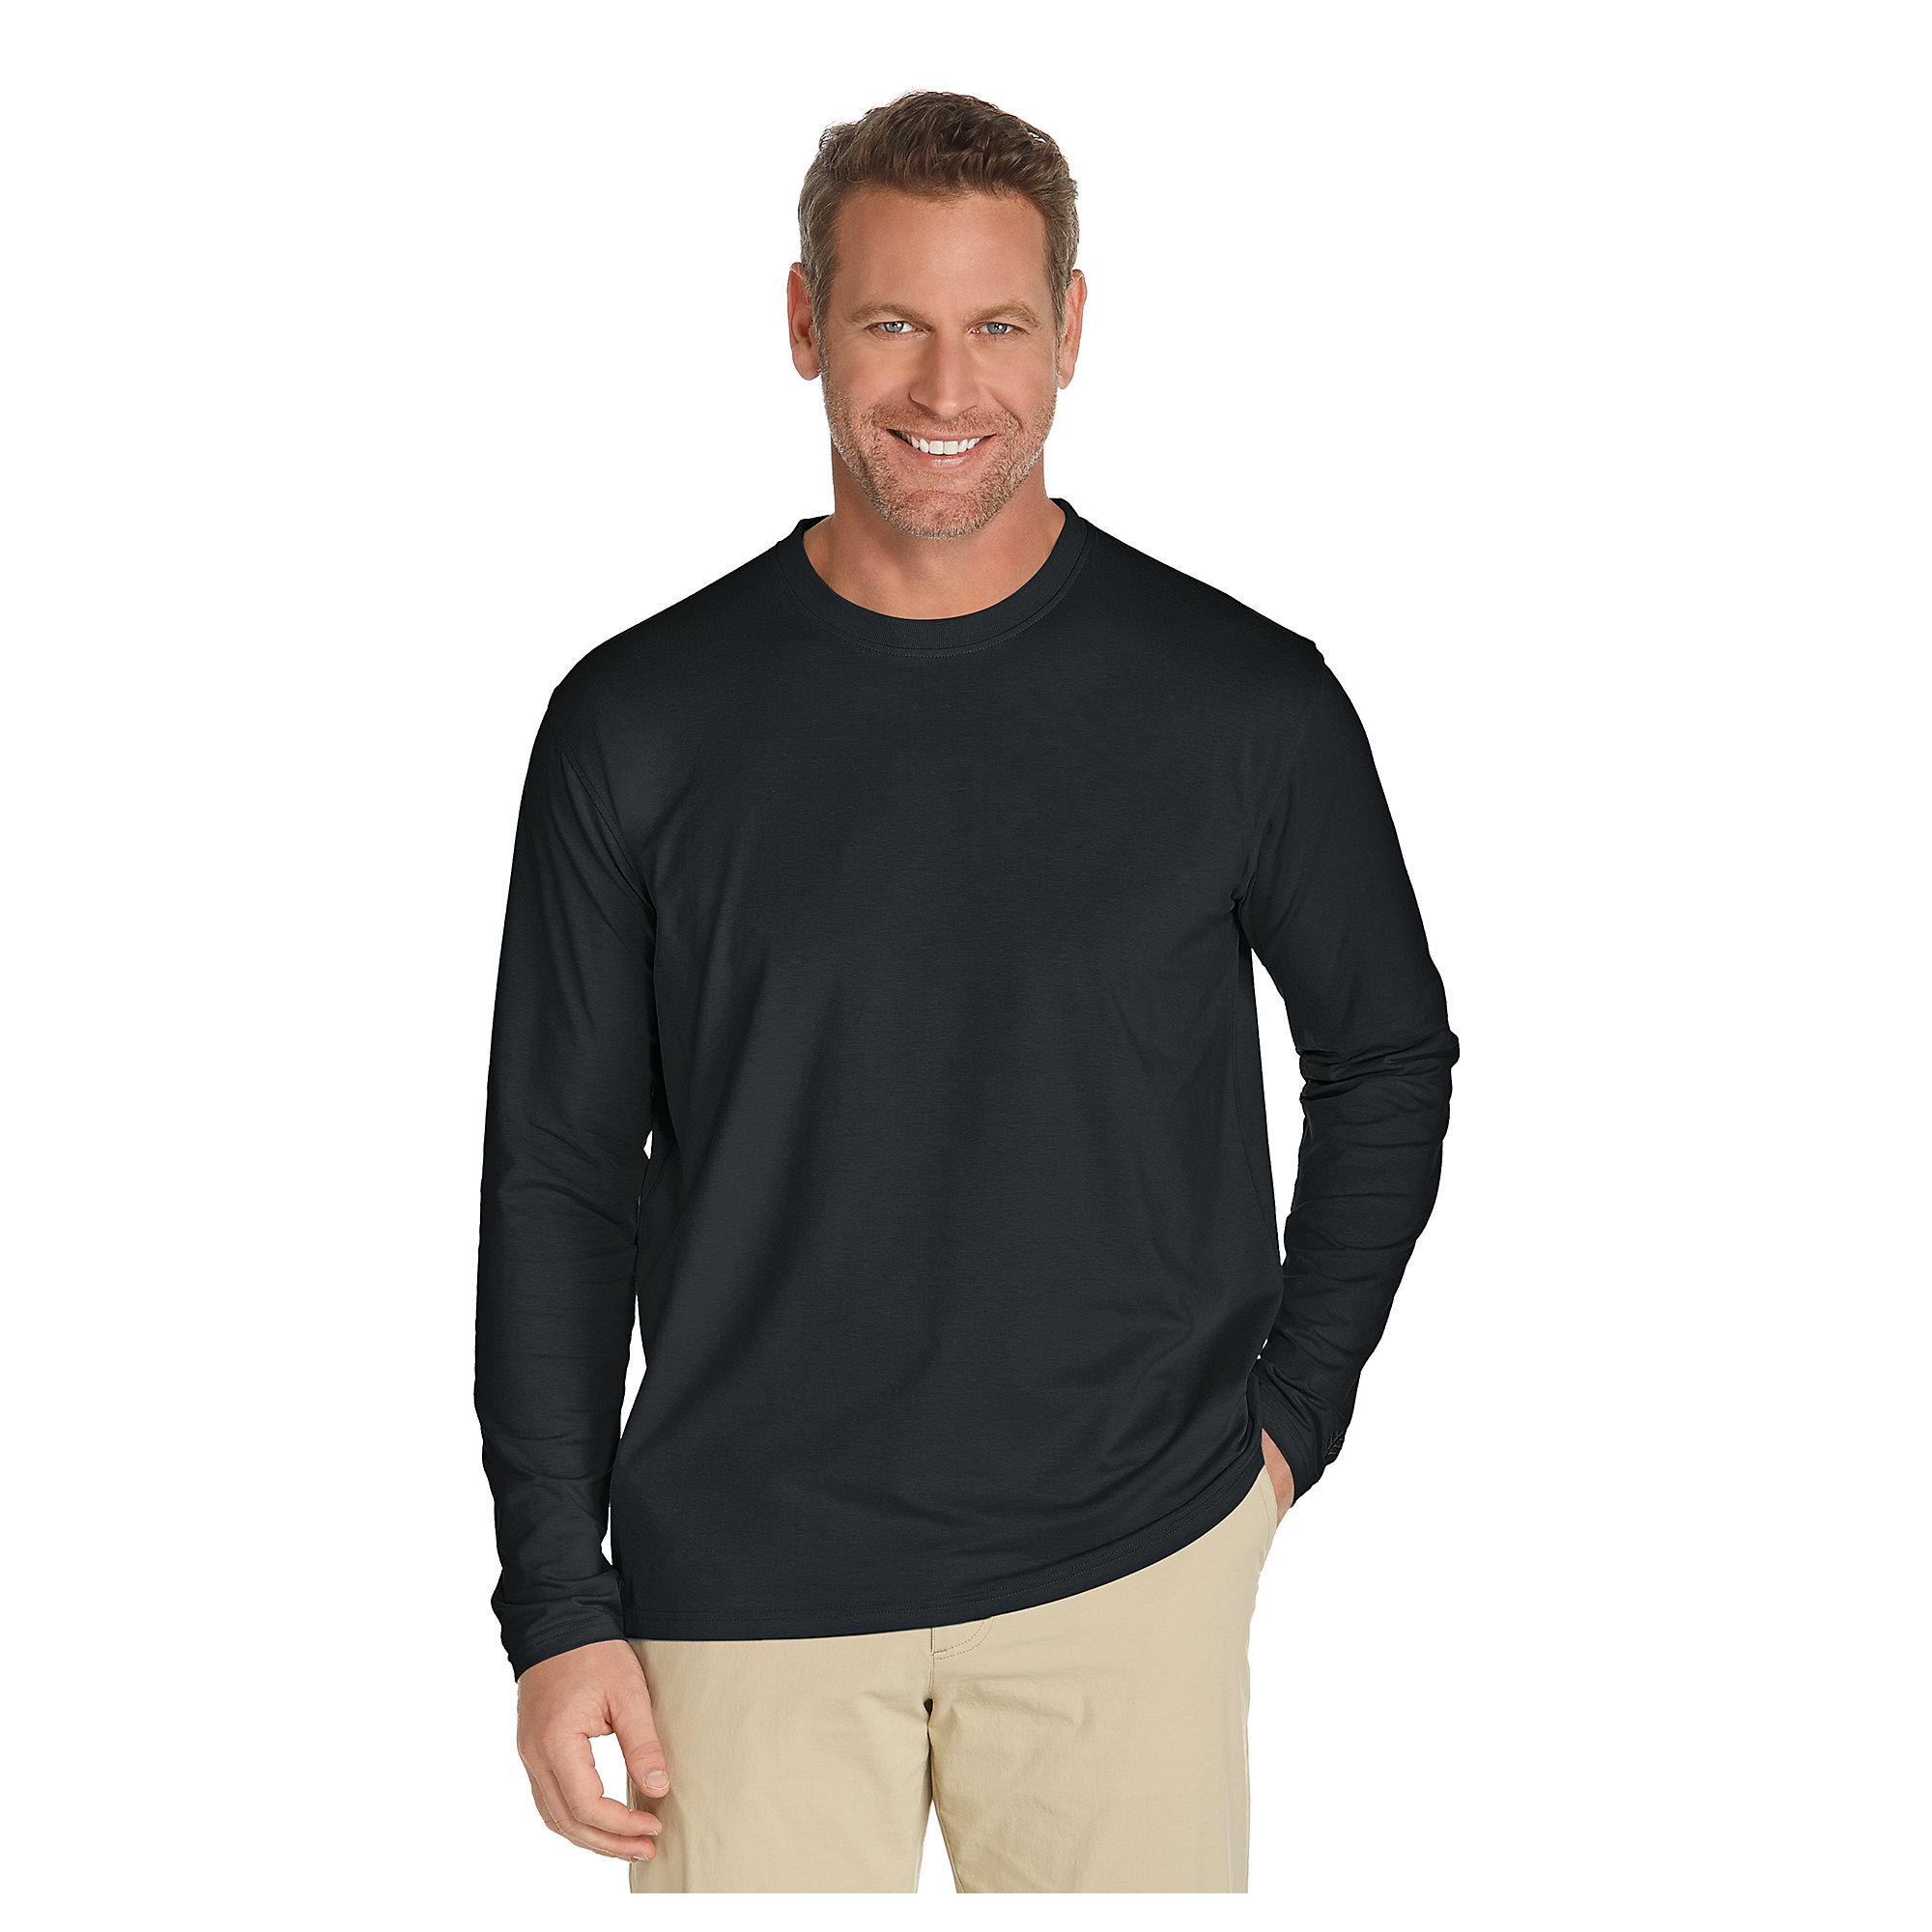 coolibar upf 50 mens zno long sleeve t shirt sun protective